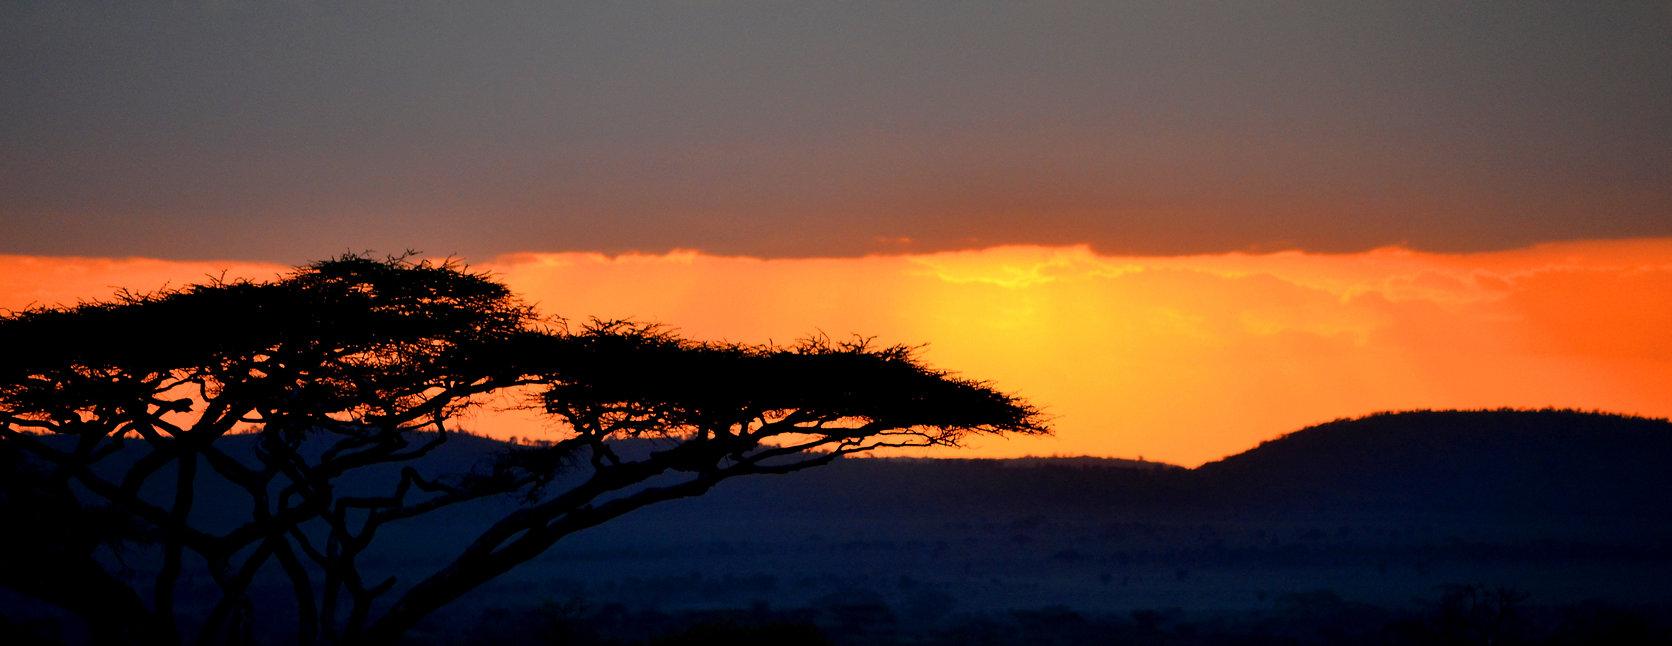 Safari en Tanzania. Viajes por Tanzania. Safaris a medida